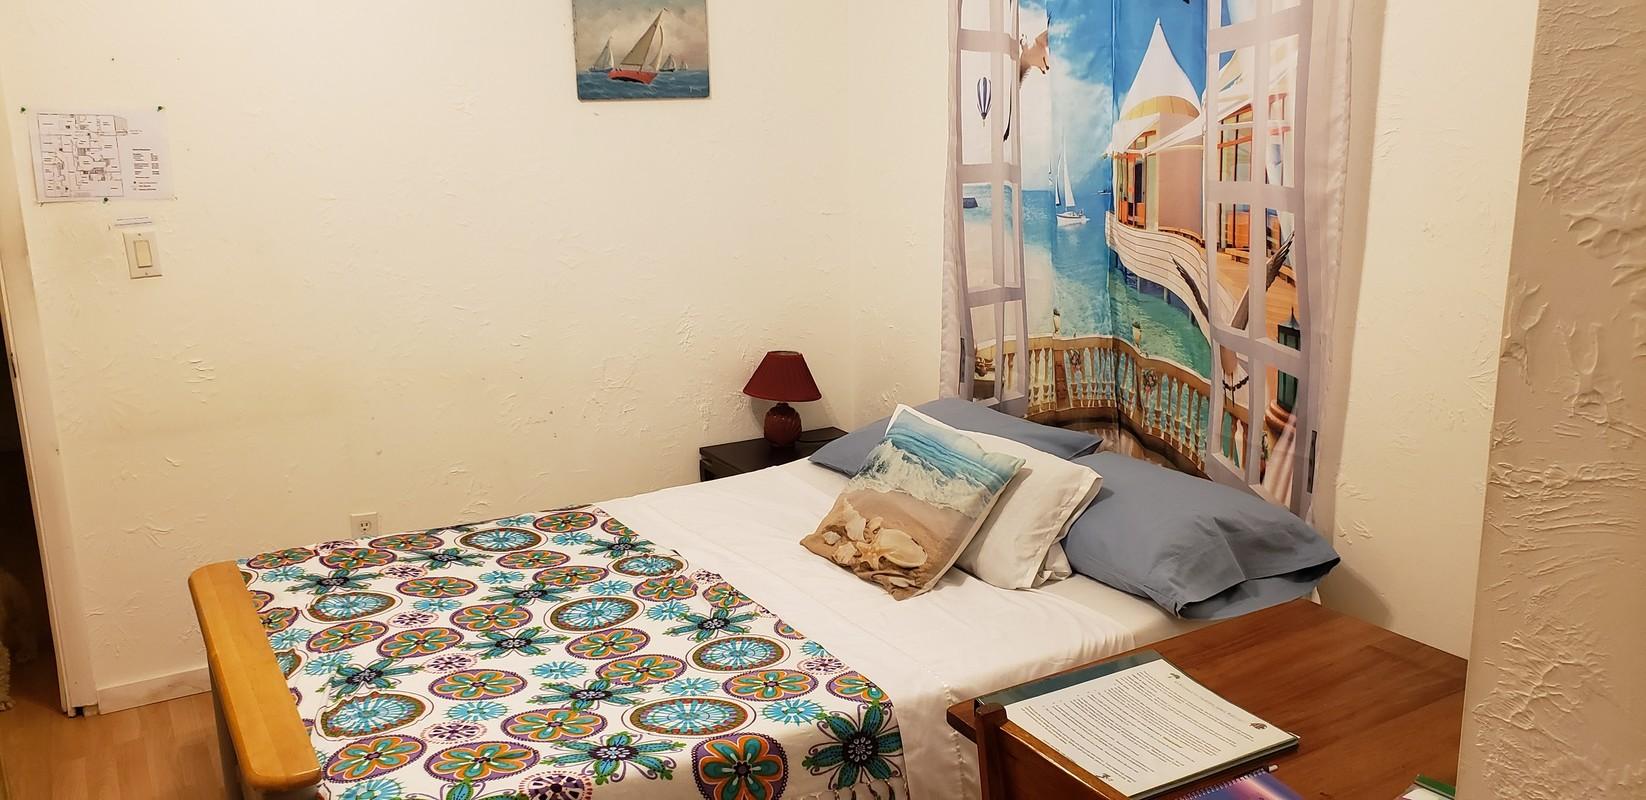 Grecian room